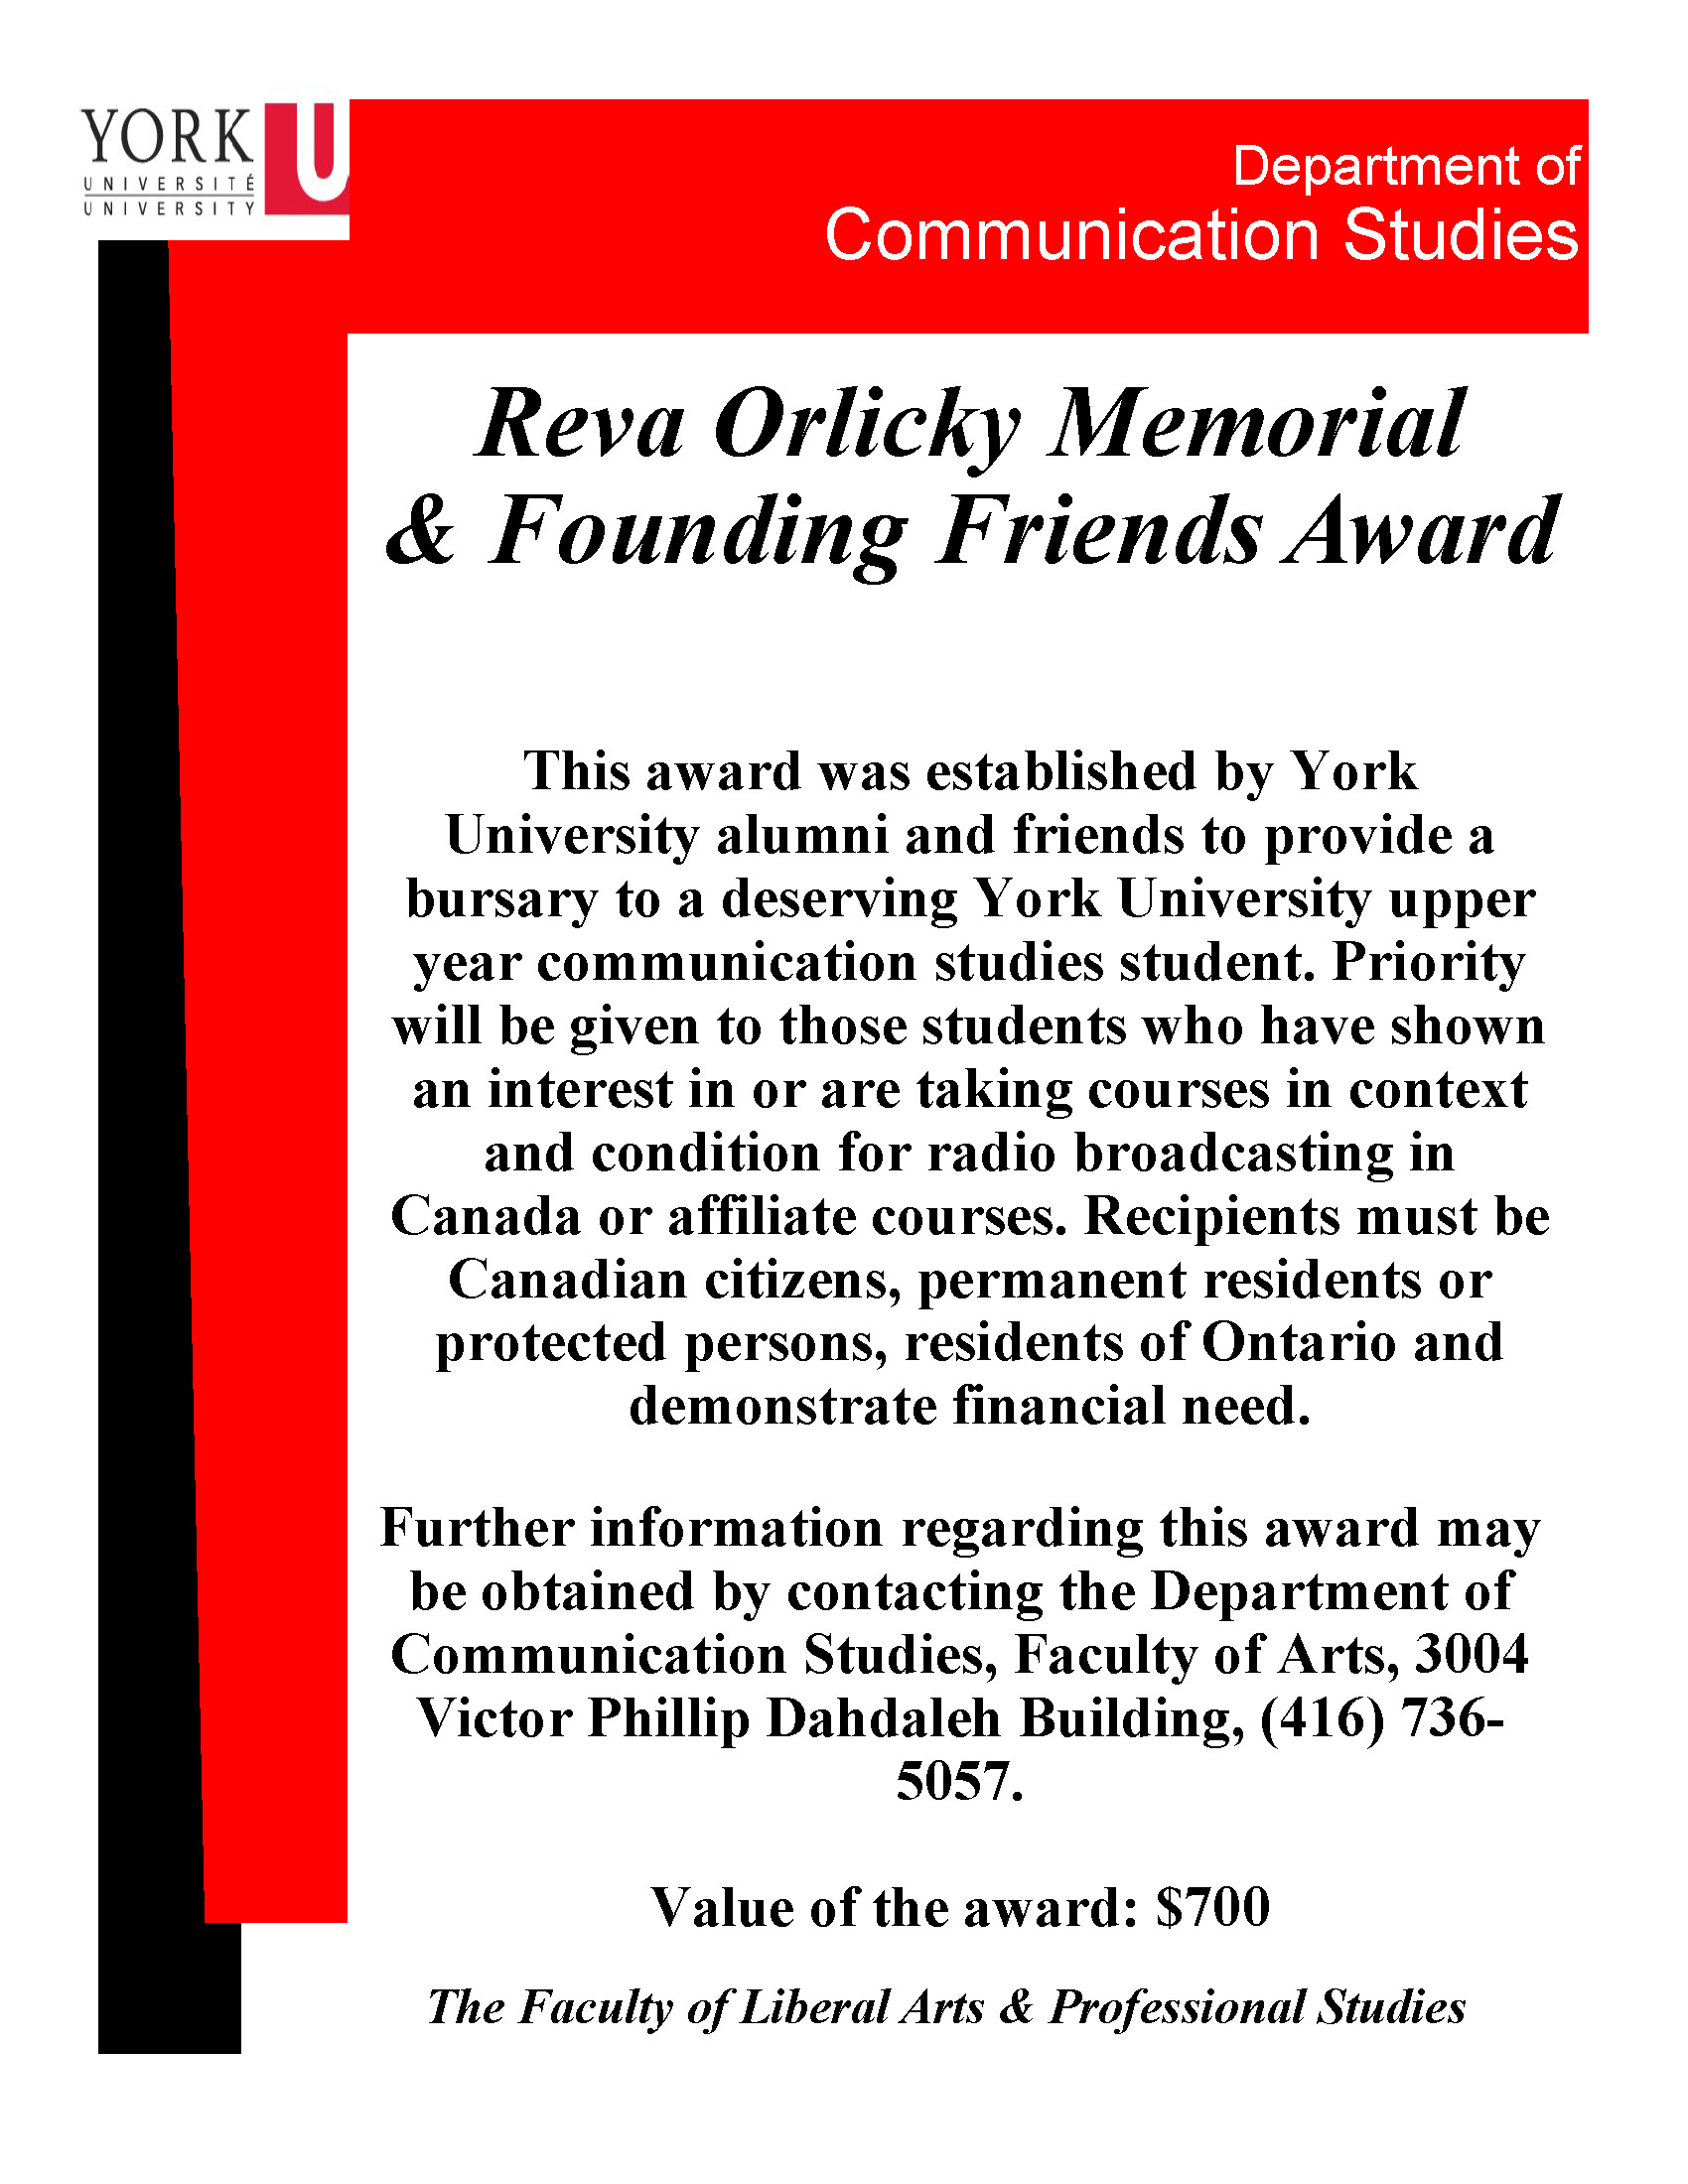 Reva Orlicky & Founding Friends Award